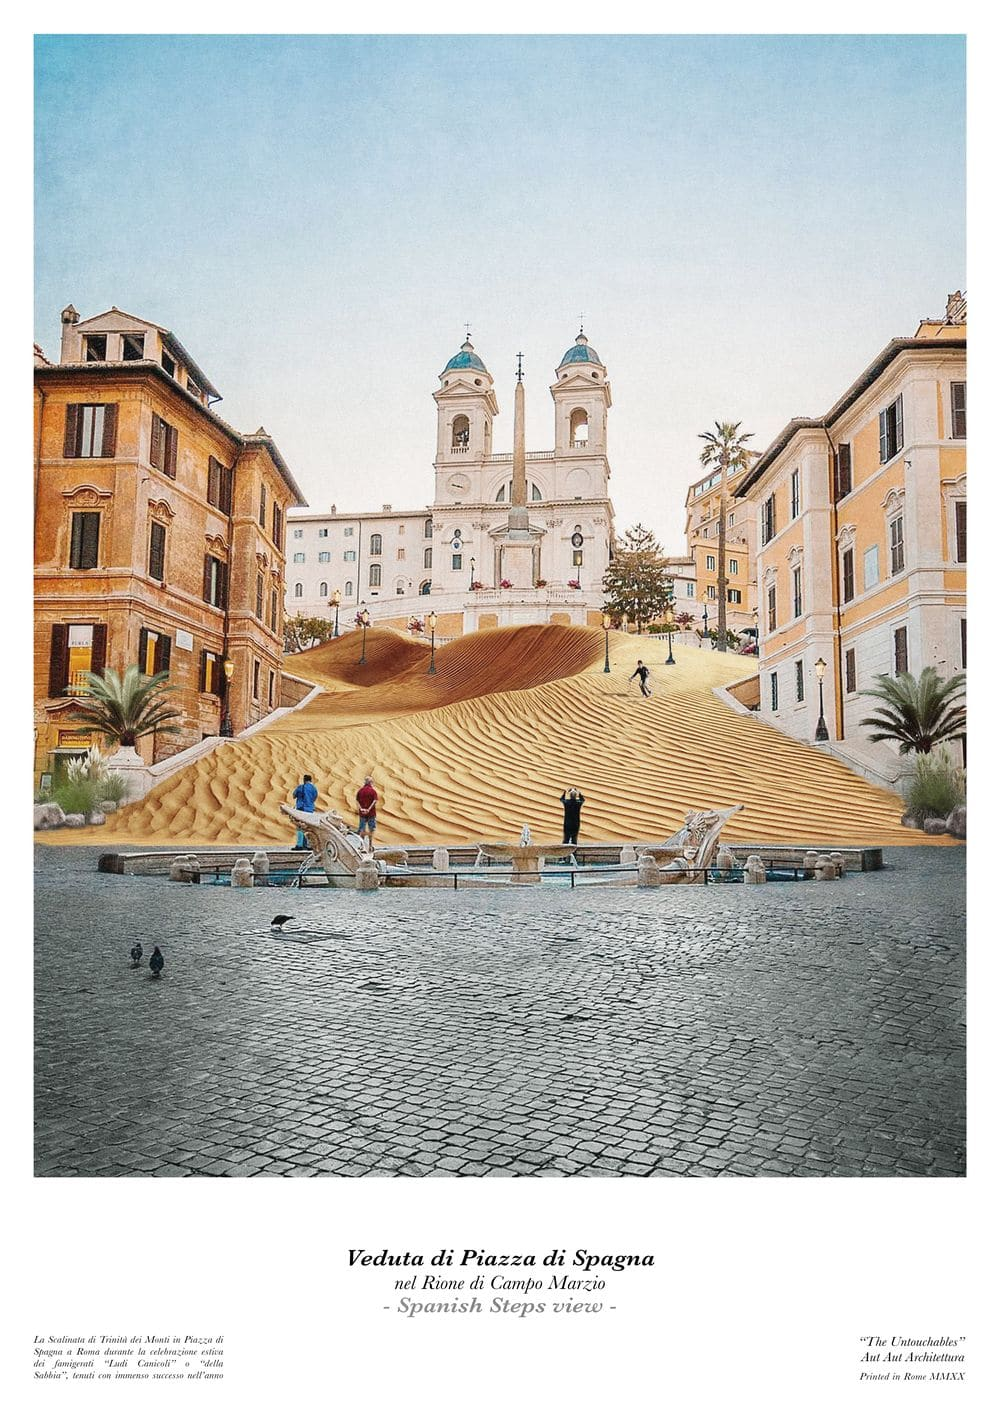 Piazza di Spagna by AUT AUT ARCHITETTURA